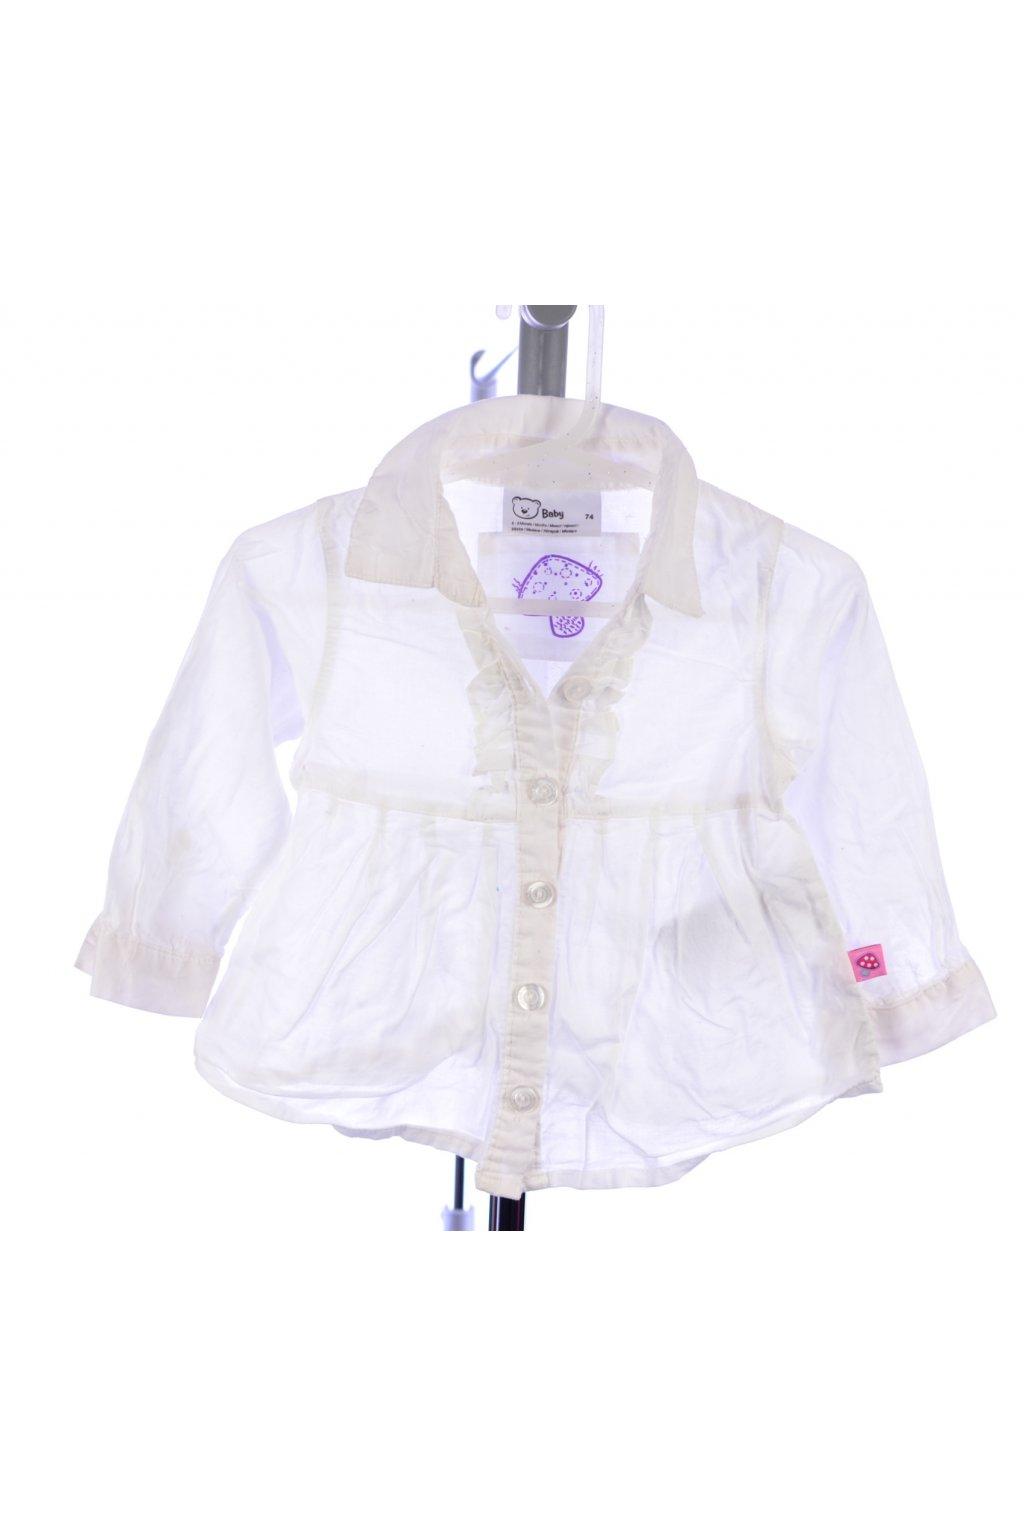 Halenka košile  Baby 74 bílá